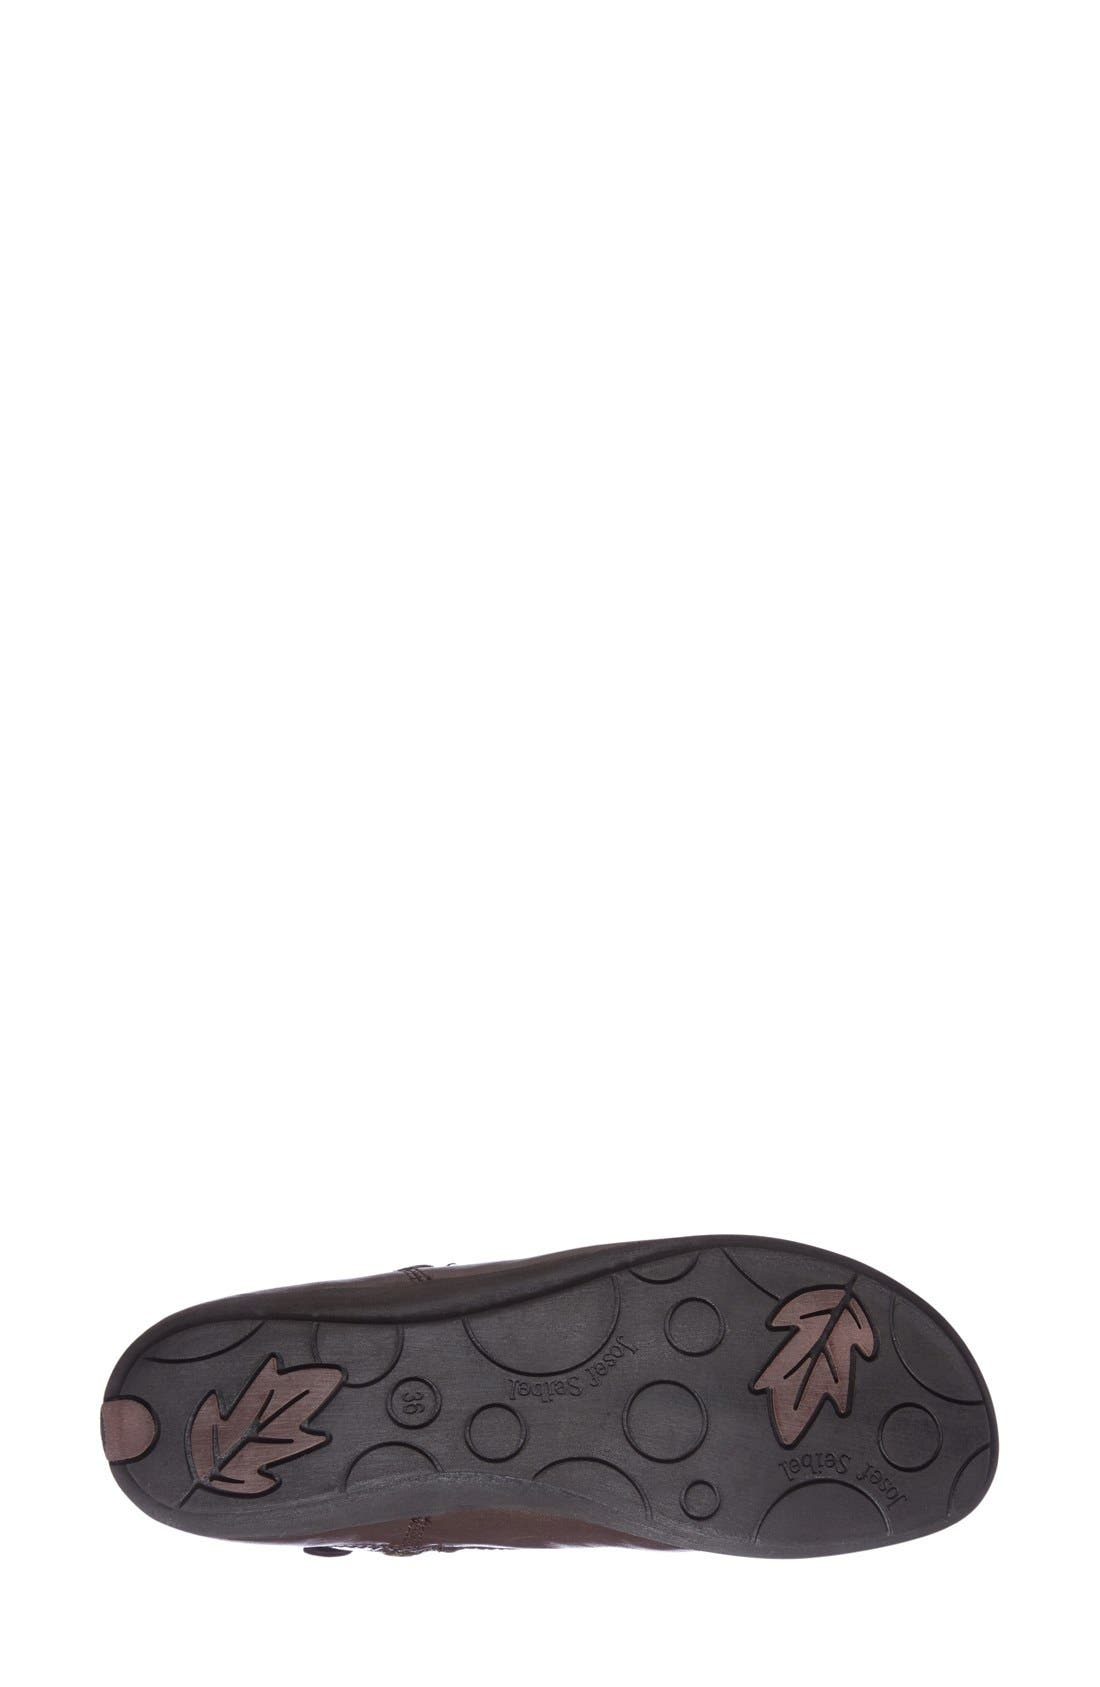 'Faye 05' Boot,                             Alternate thumbnail 4, color,                             Moro